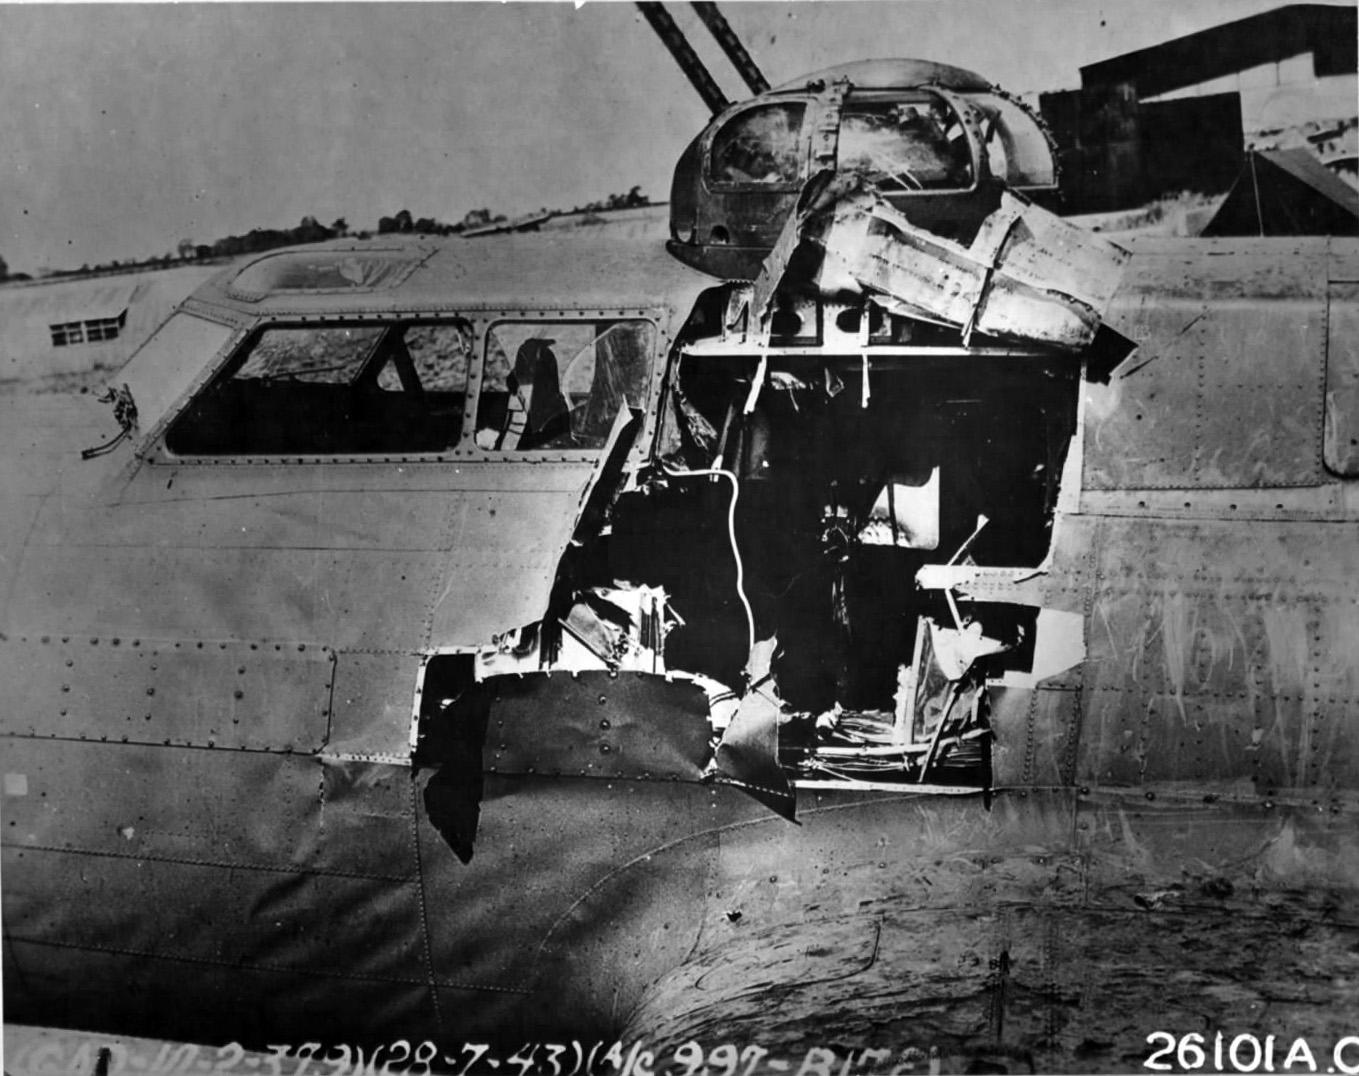 B-17 #42-29997 / Sack